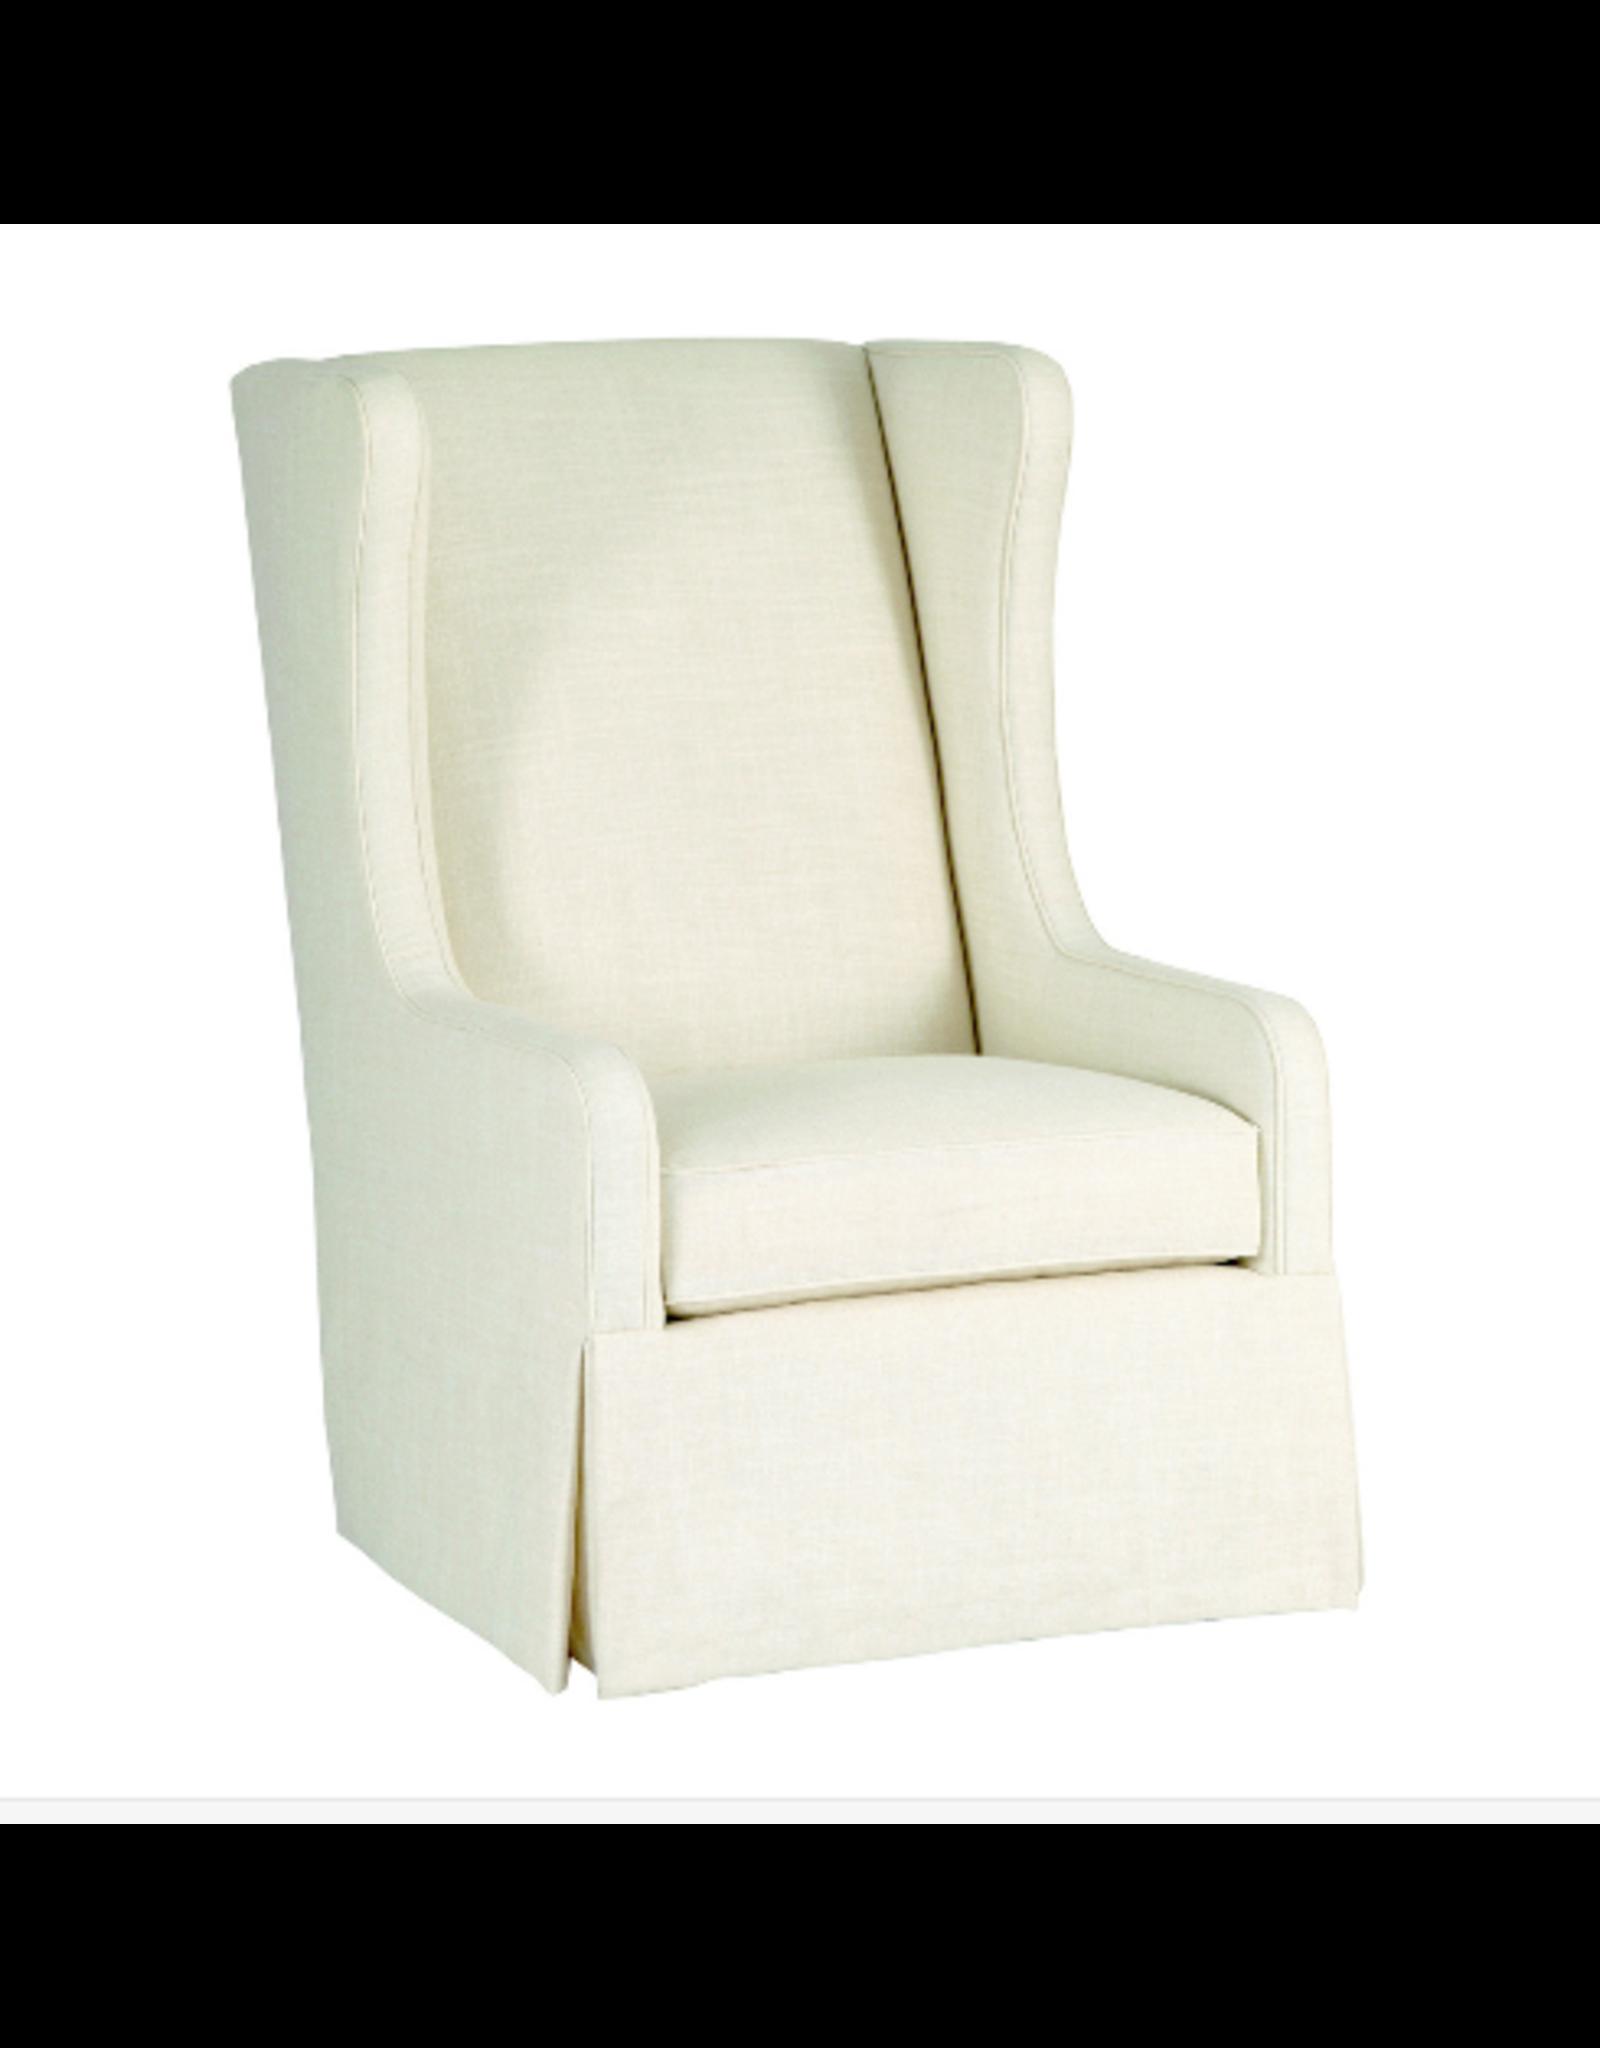 Gabby Reagan Swivel Chair